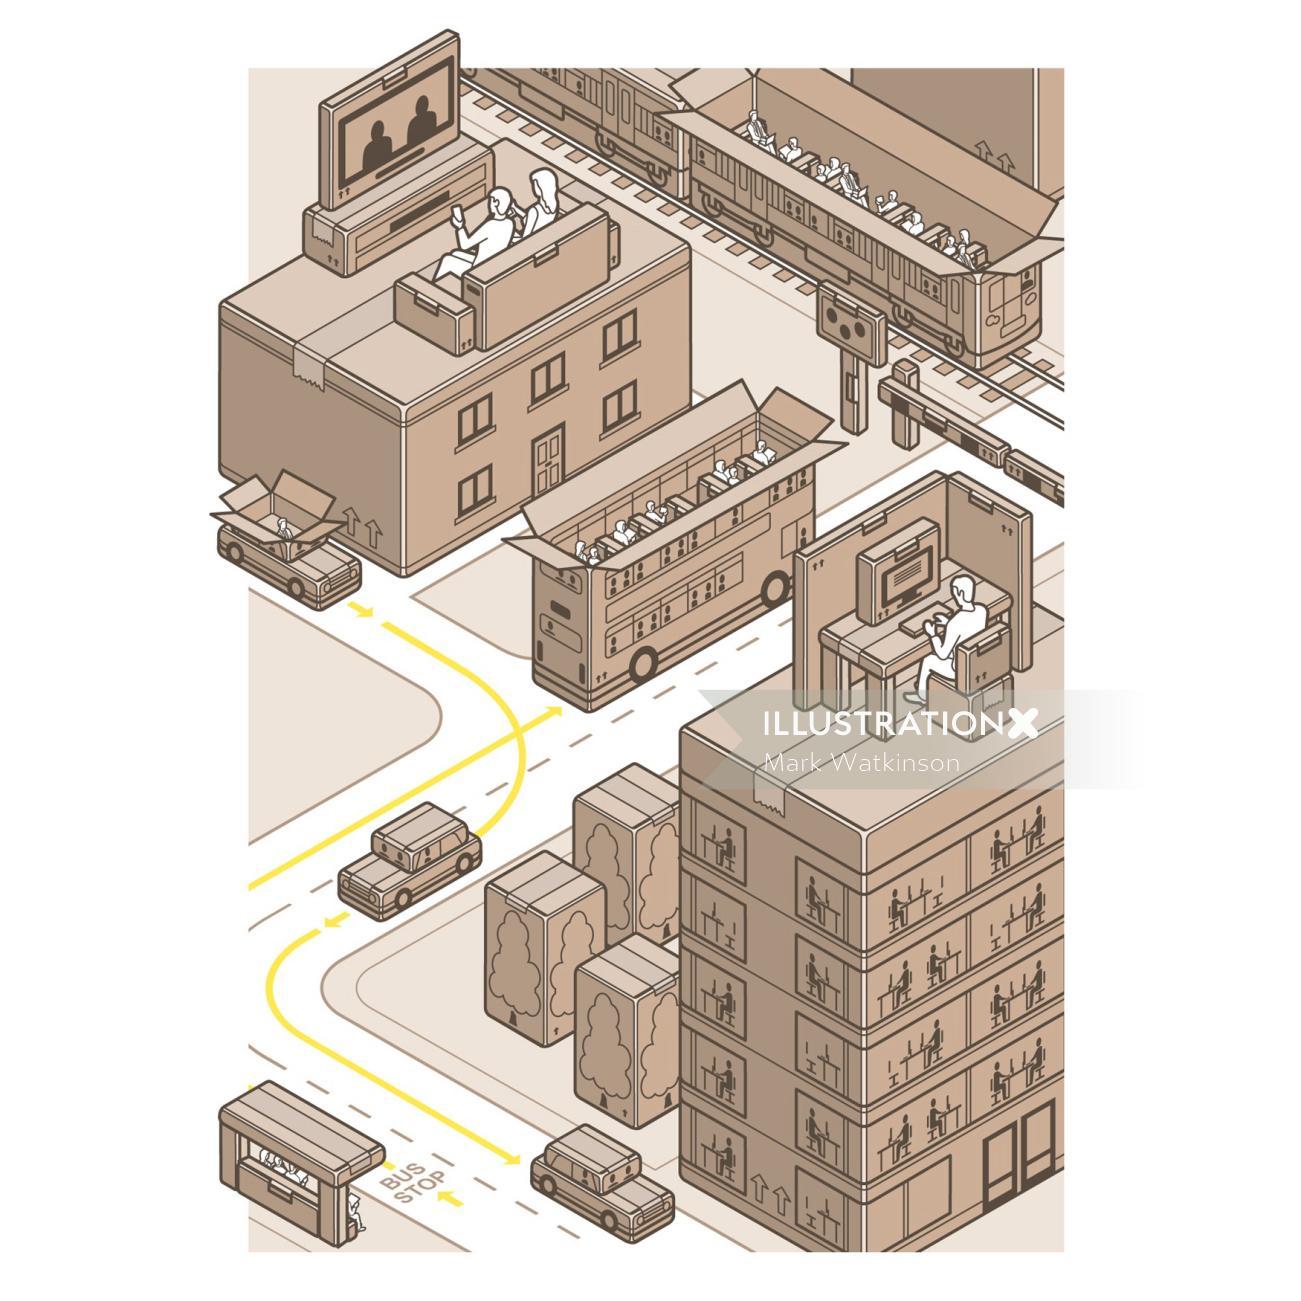 Vector architecture illustration by Mark Watkinson